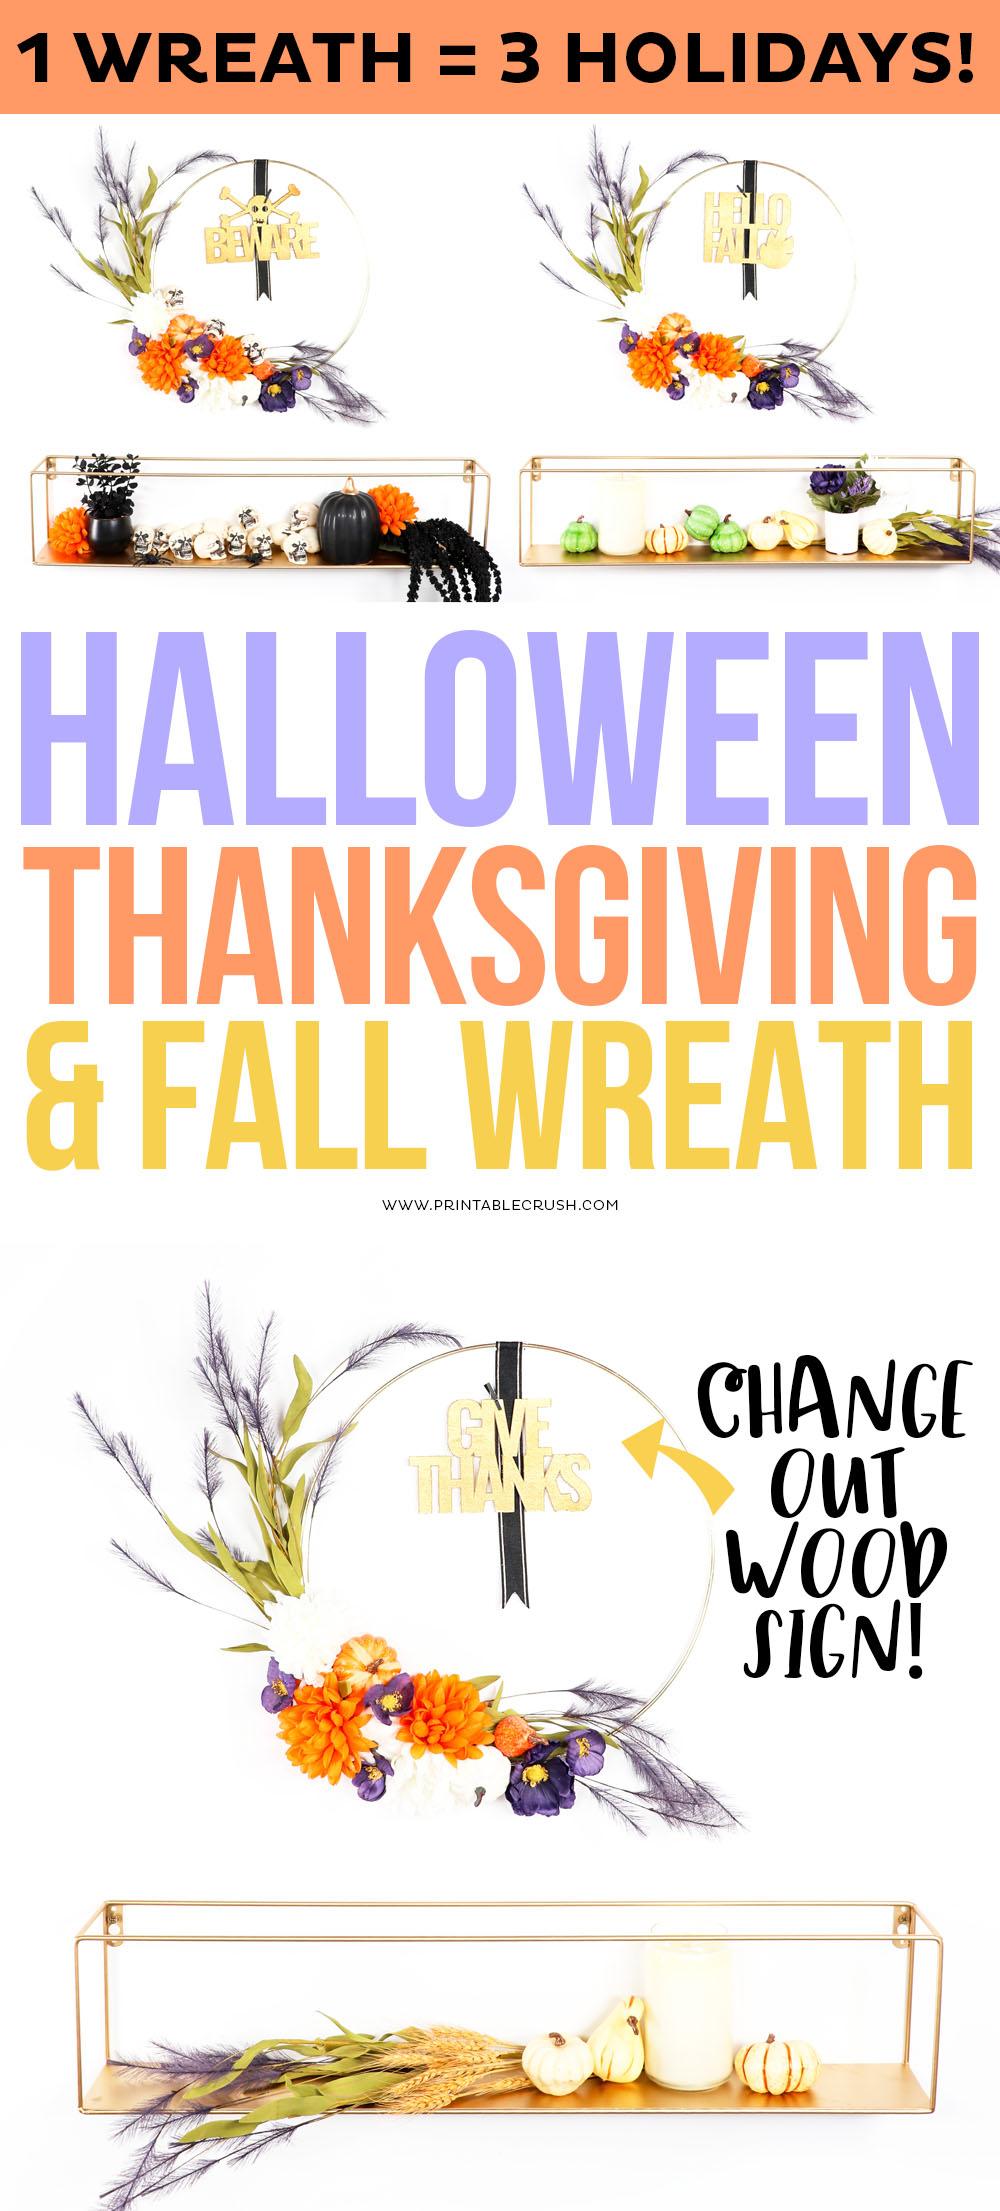 Halloween, Thanksgiving, and DIY Fall Wreath Tutorial - One Wreath for the WHOLE Fall Season! #printablecrush #fallwreath #fallcrafts #halloweenwreath #thanksgivingwreath #thanksgivingcrafts #halloweencrafts #cricutcrafts #daricecrafts